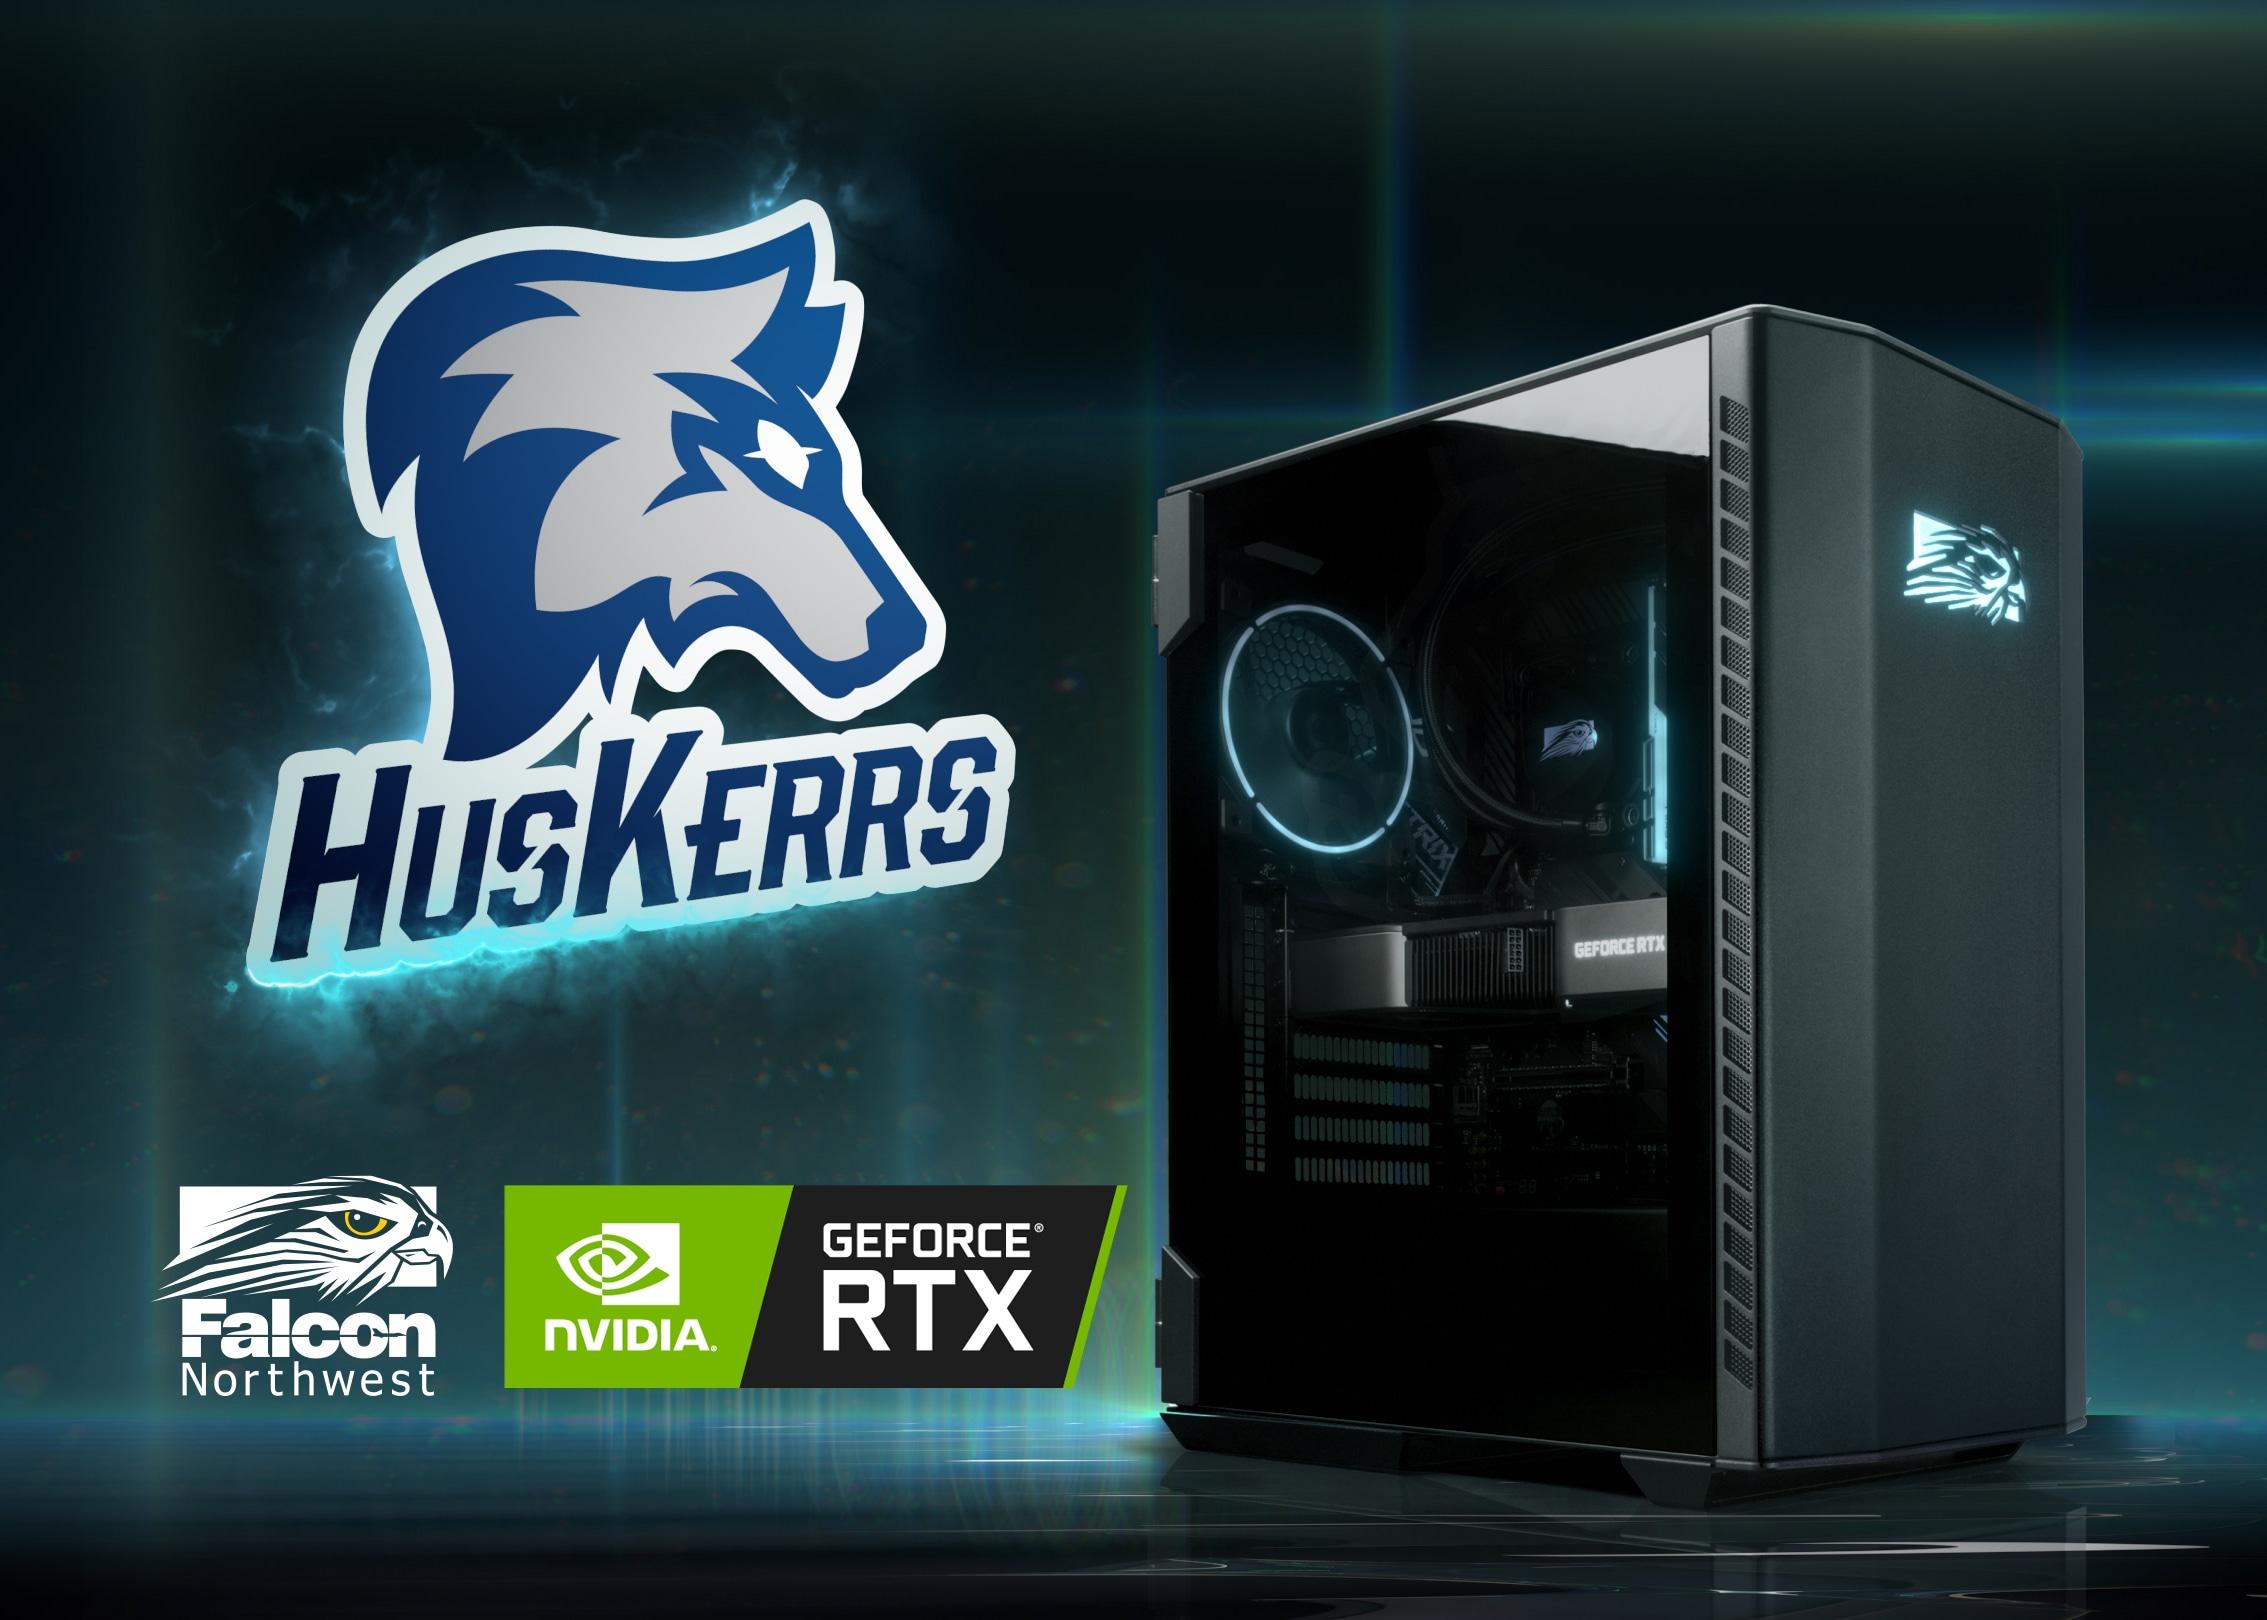 Win HusKerrs Talon PC! Giveaway Image